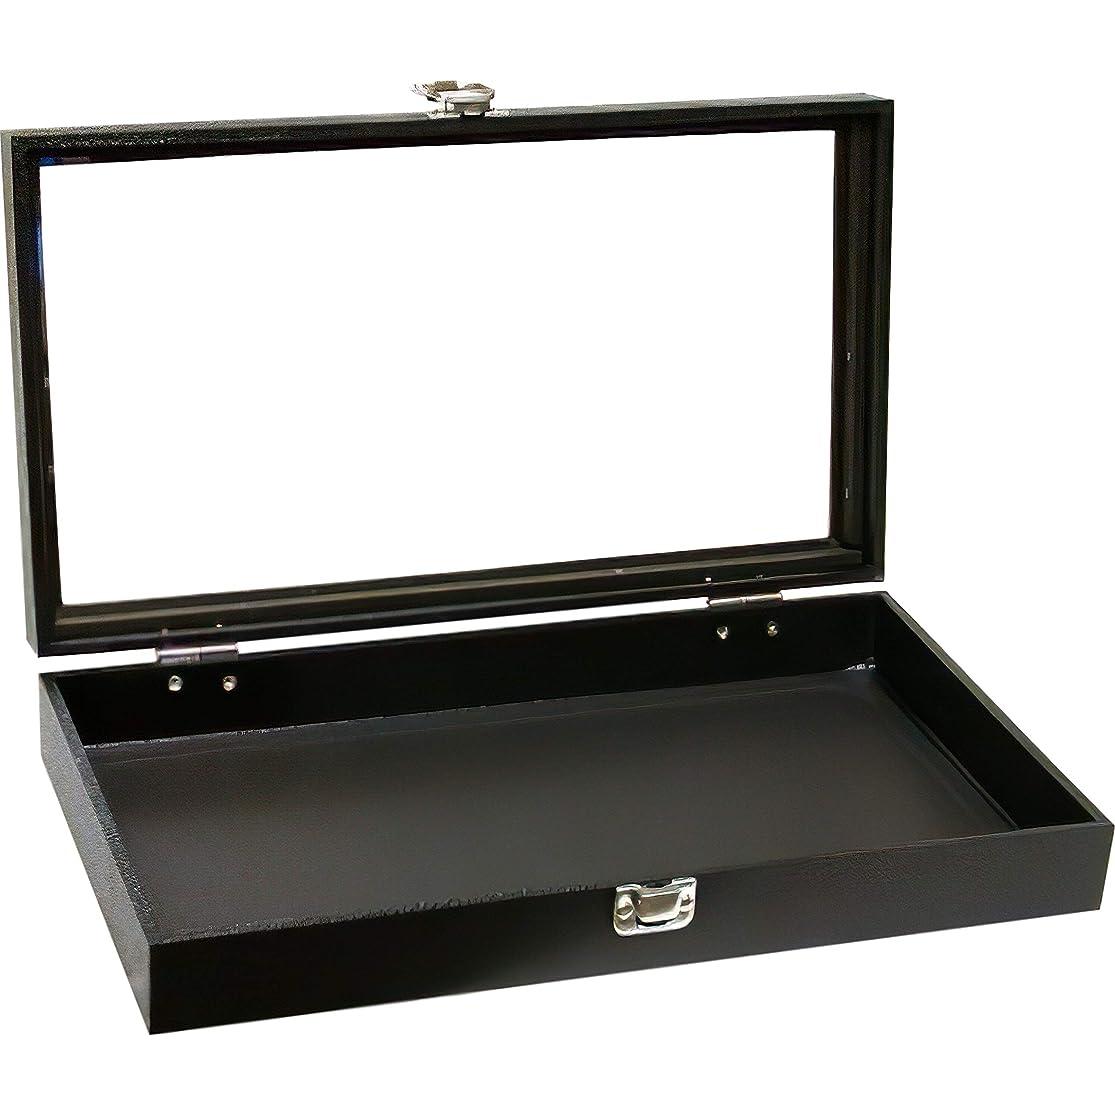 FindingKing Black Jewelry Travel Showcase Display Glass Lid Case kremgcdd1